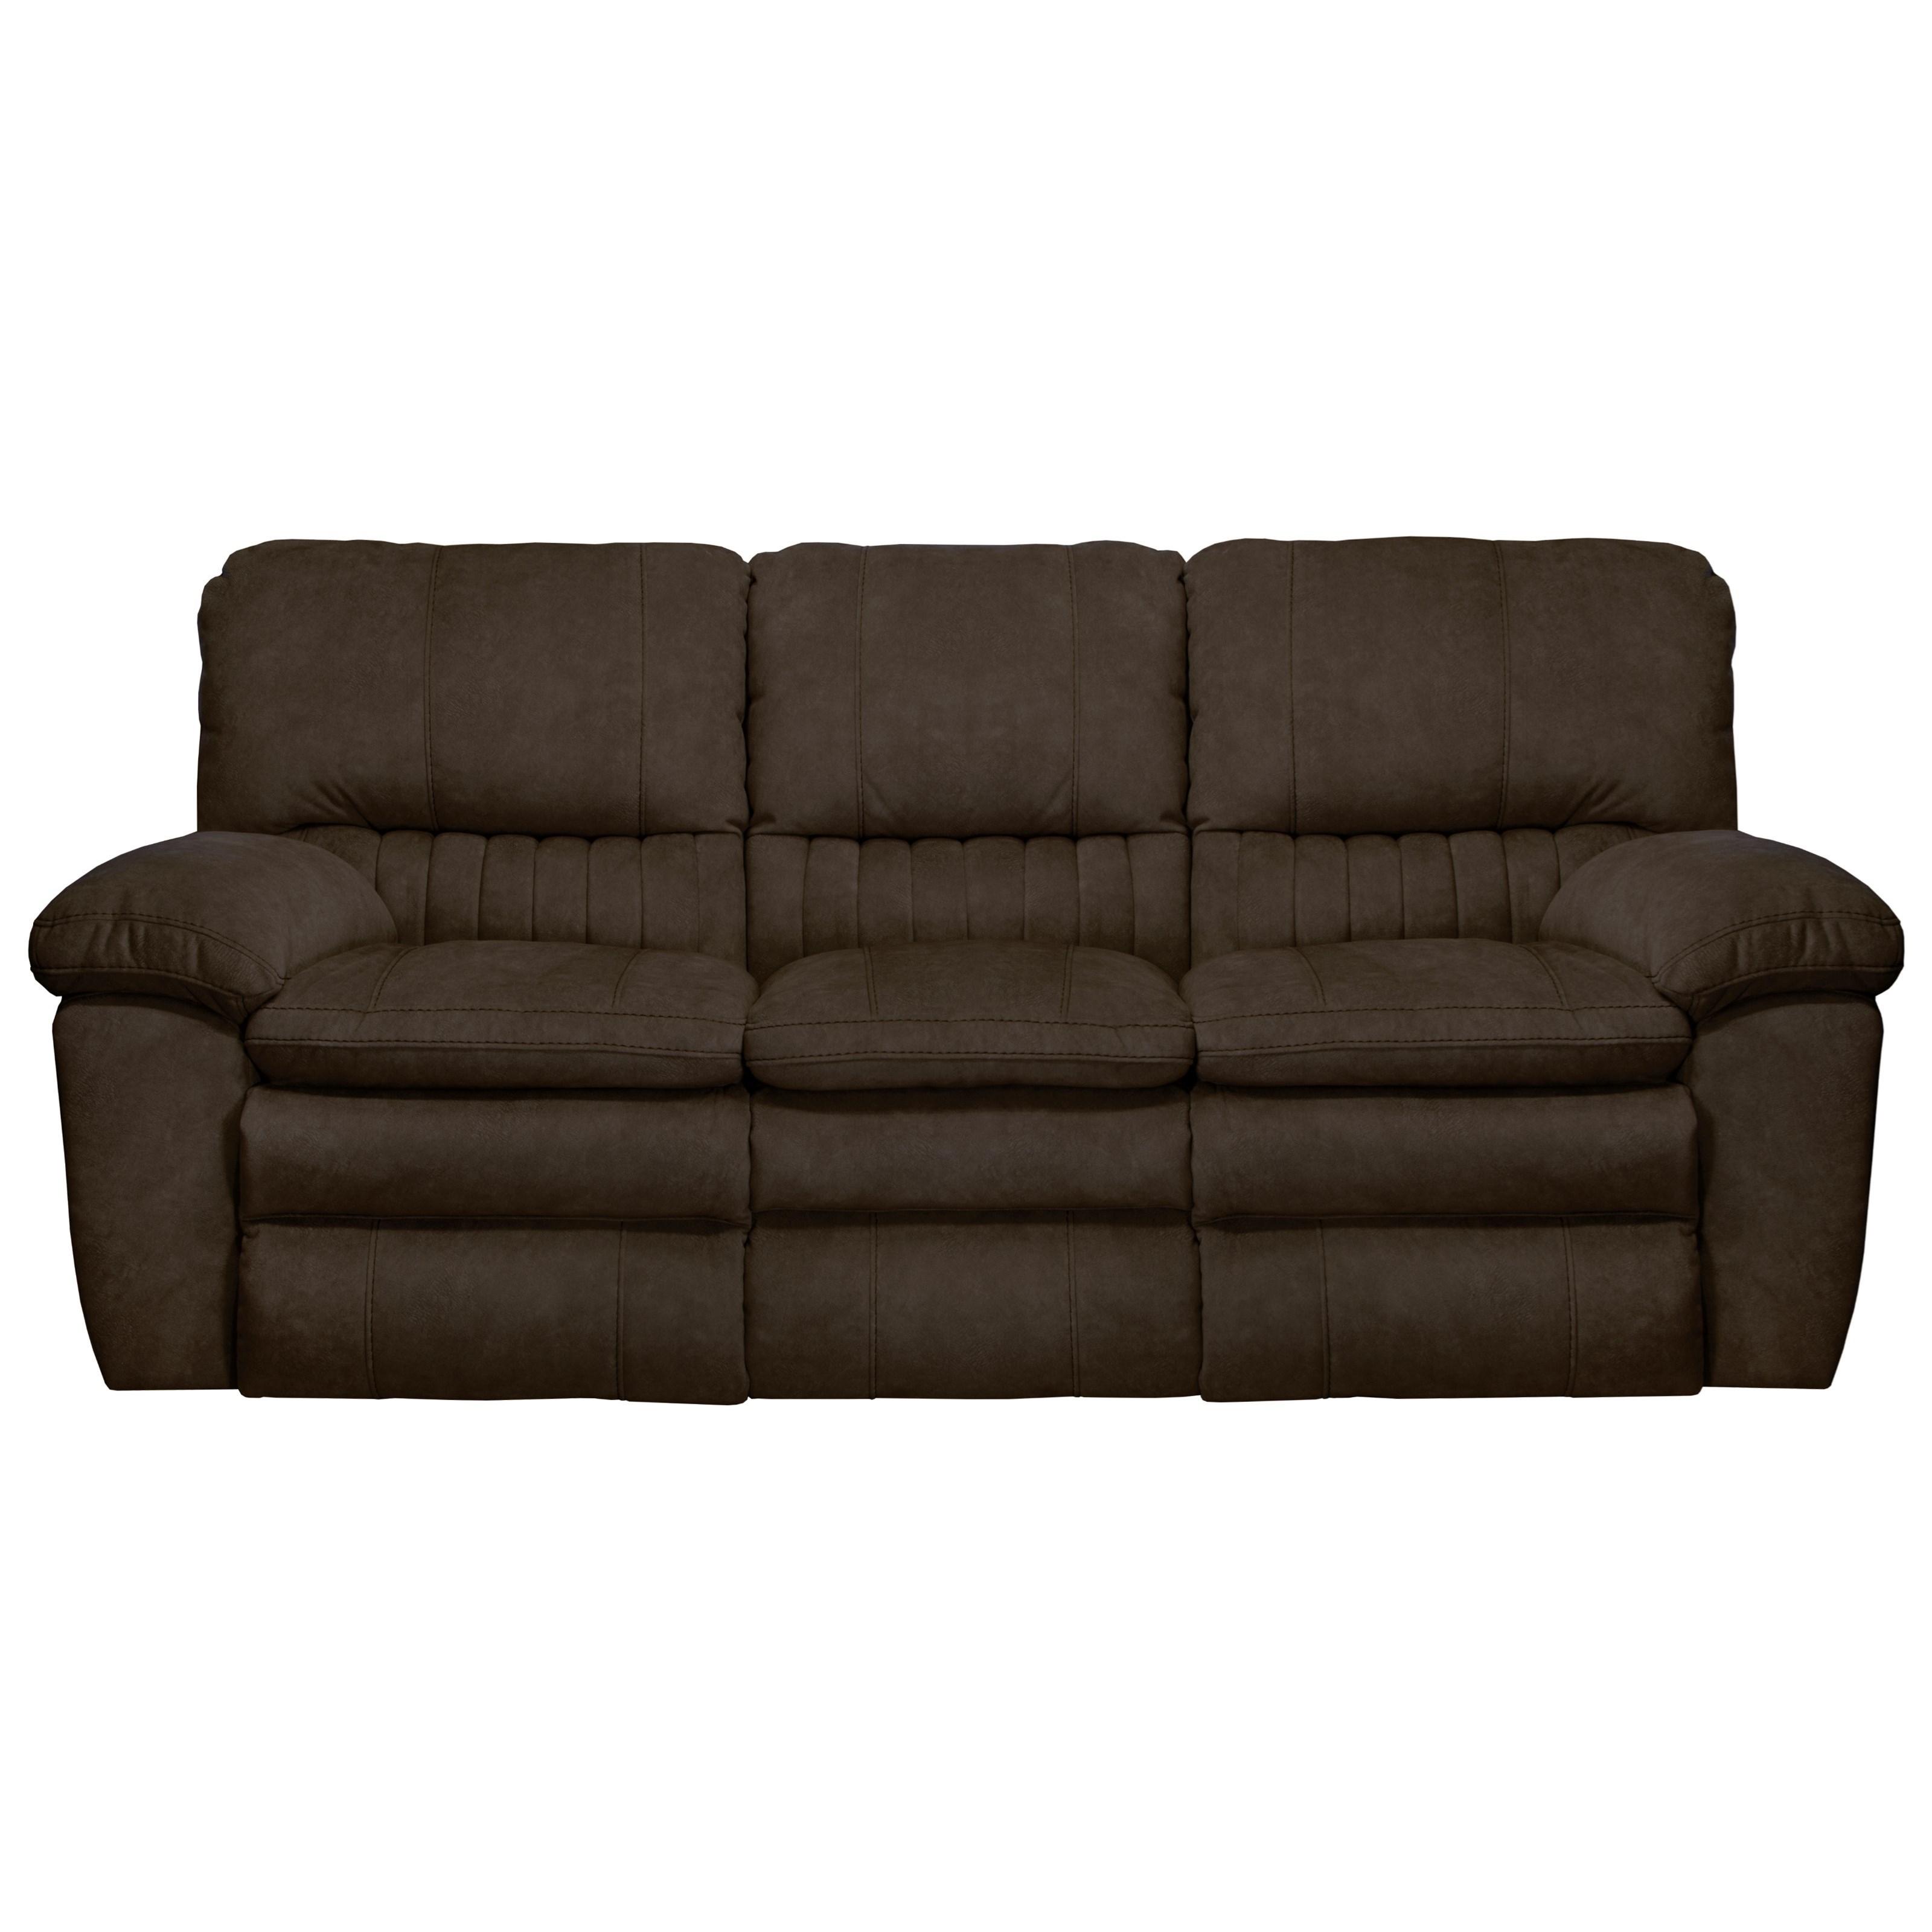 Catnapper Reyes 62401 Power Lay Flat Reclining Sofa